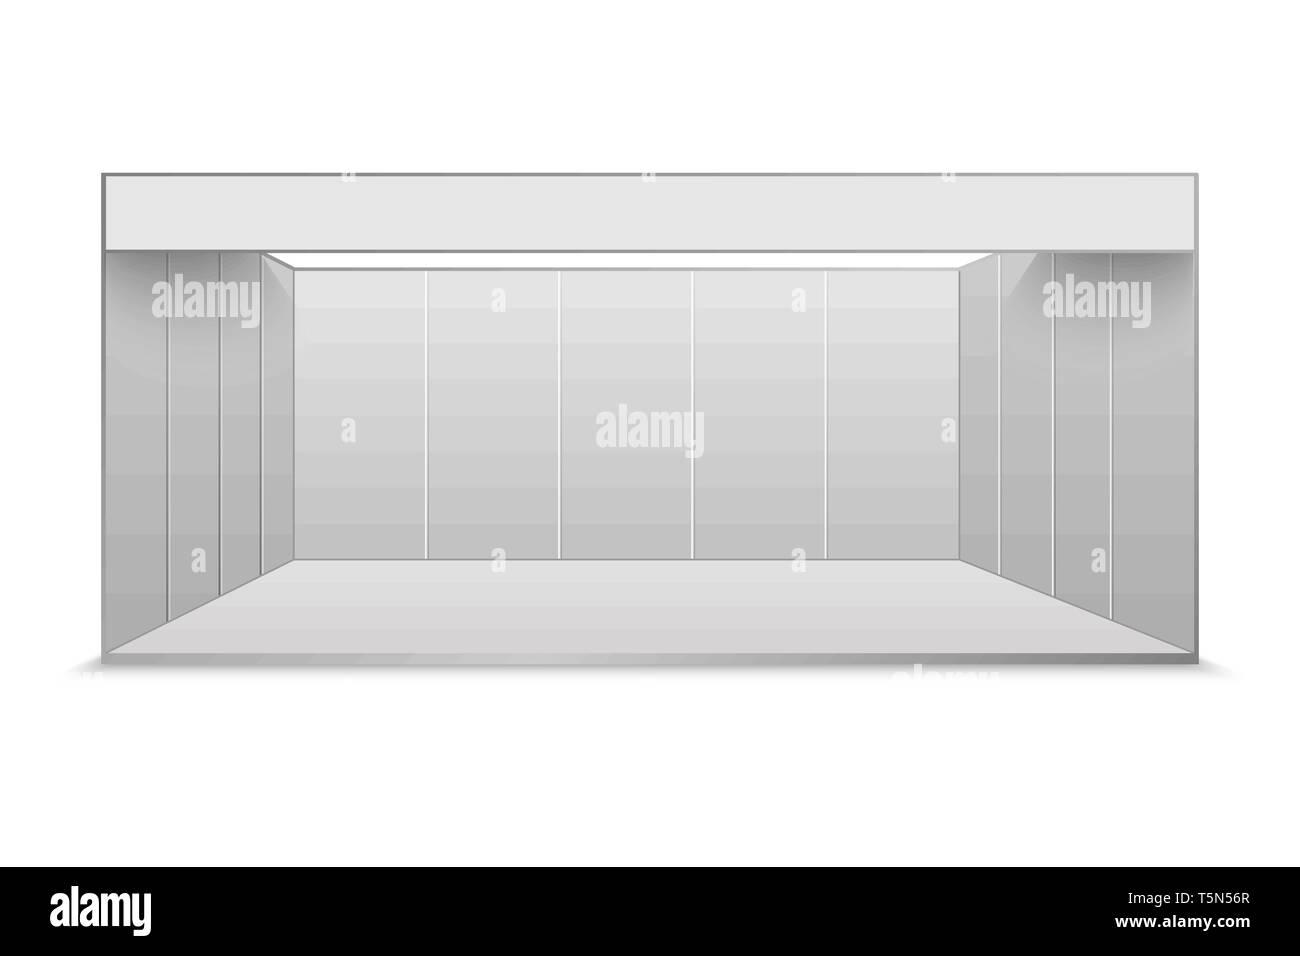 Exhibition Stand Design Presentation : White blank exhibition stand presentation event room stock vector